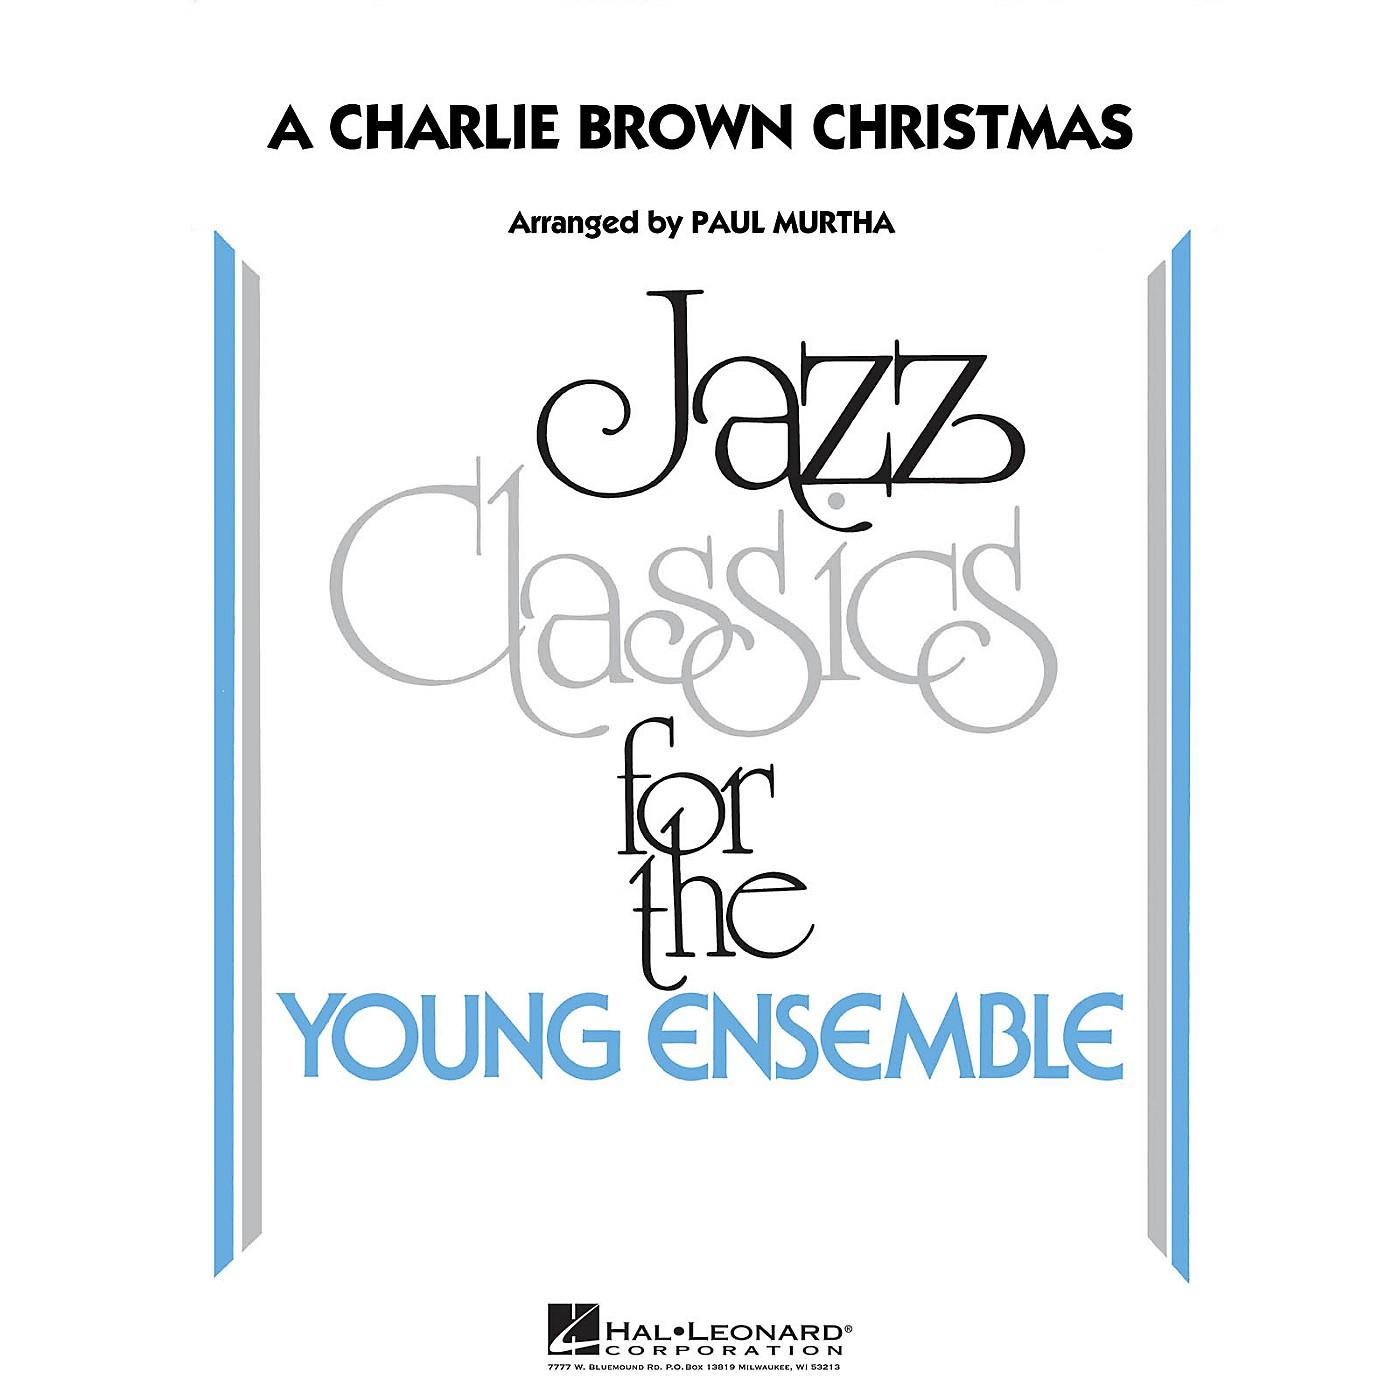 Hal Leonard A Charlie Brown Christmas Jazz Band Level 3 Arranged by Paul Murtha thumbnail